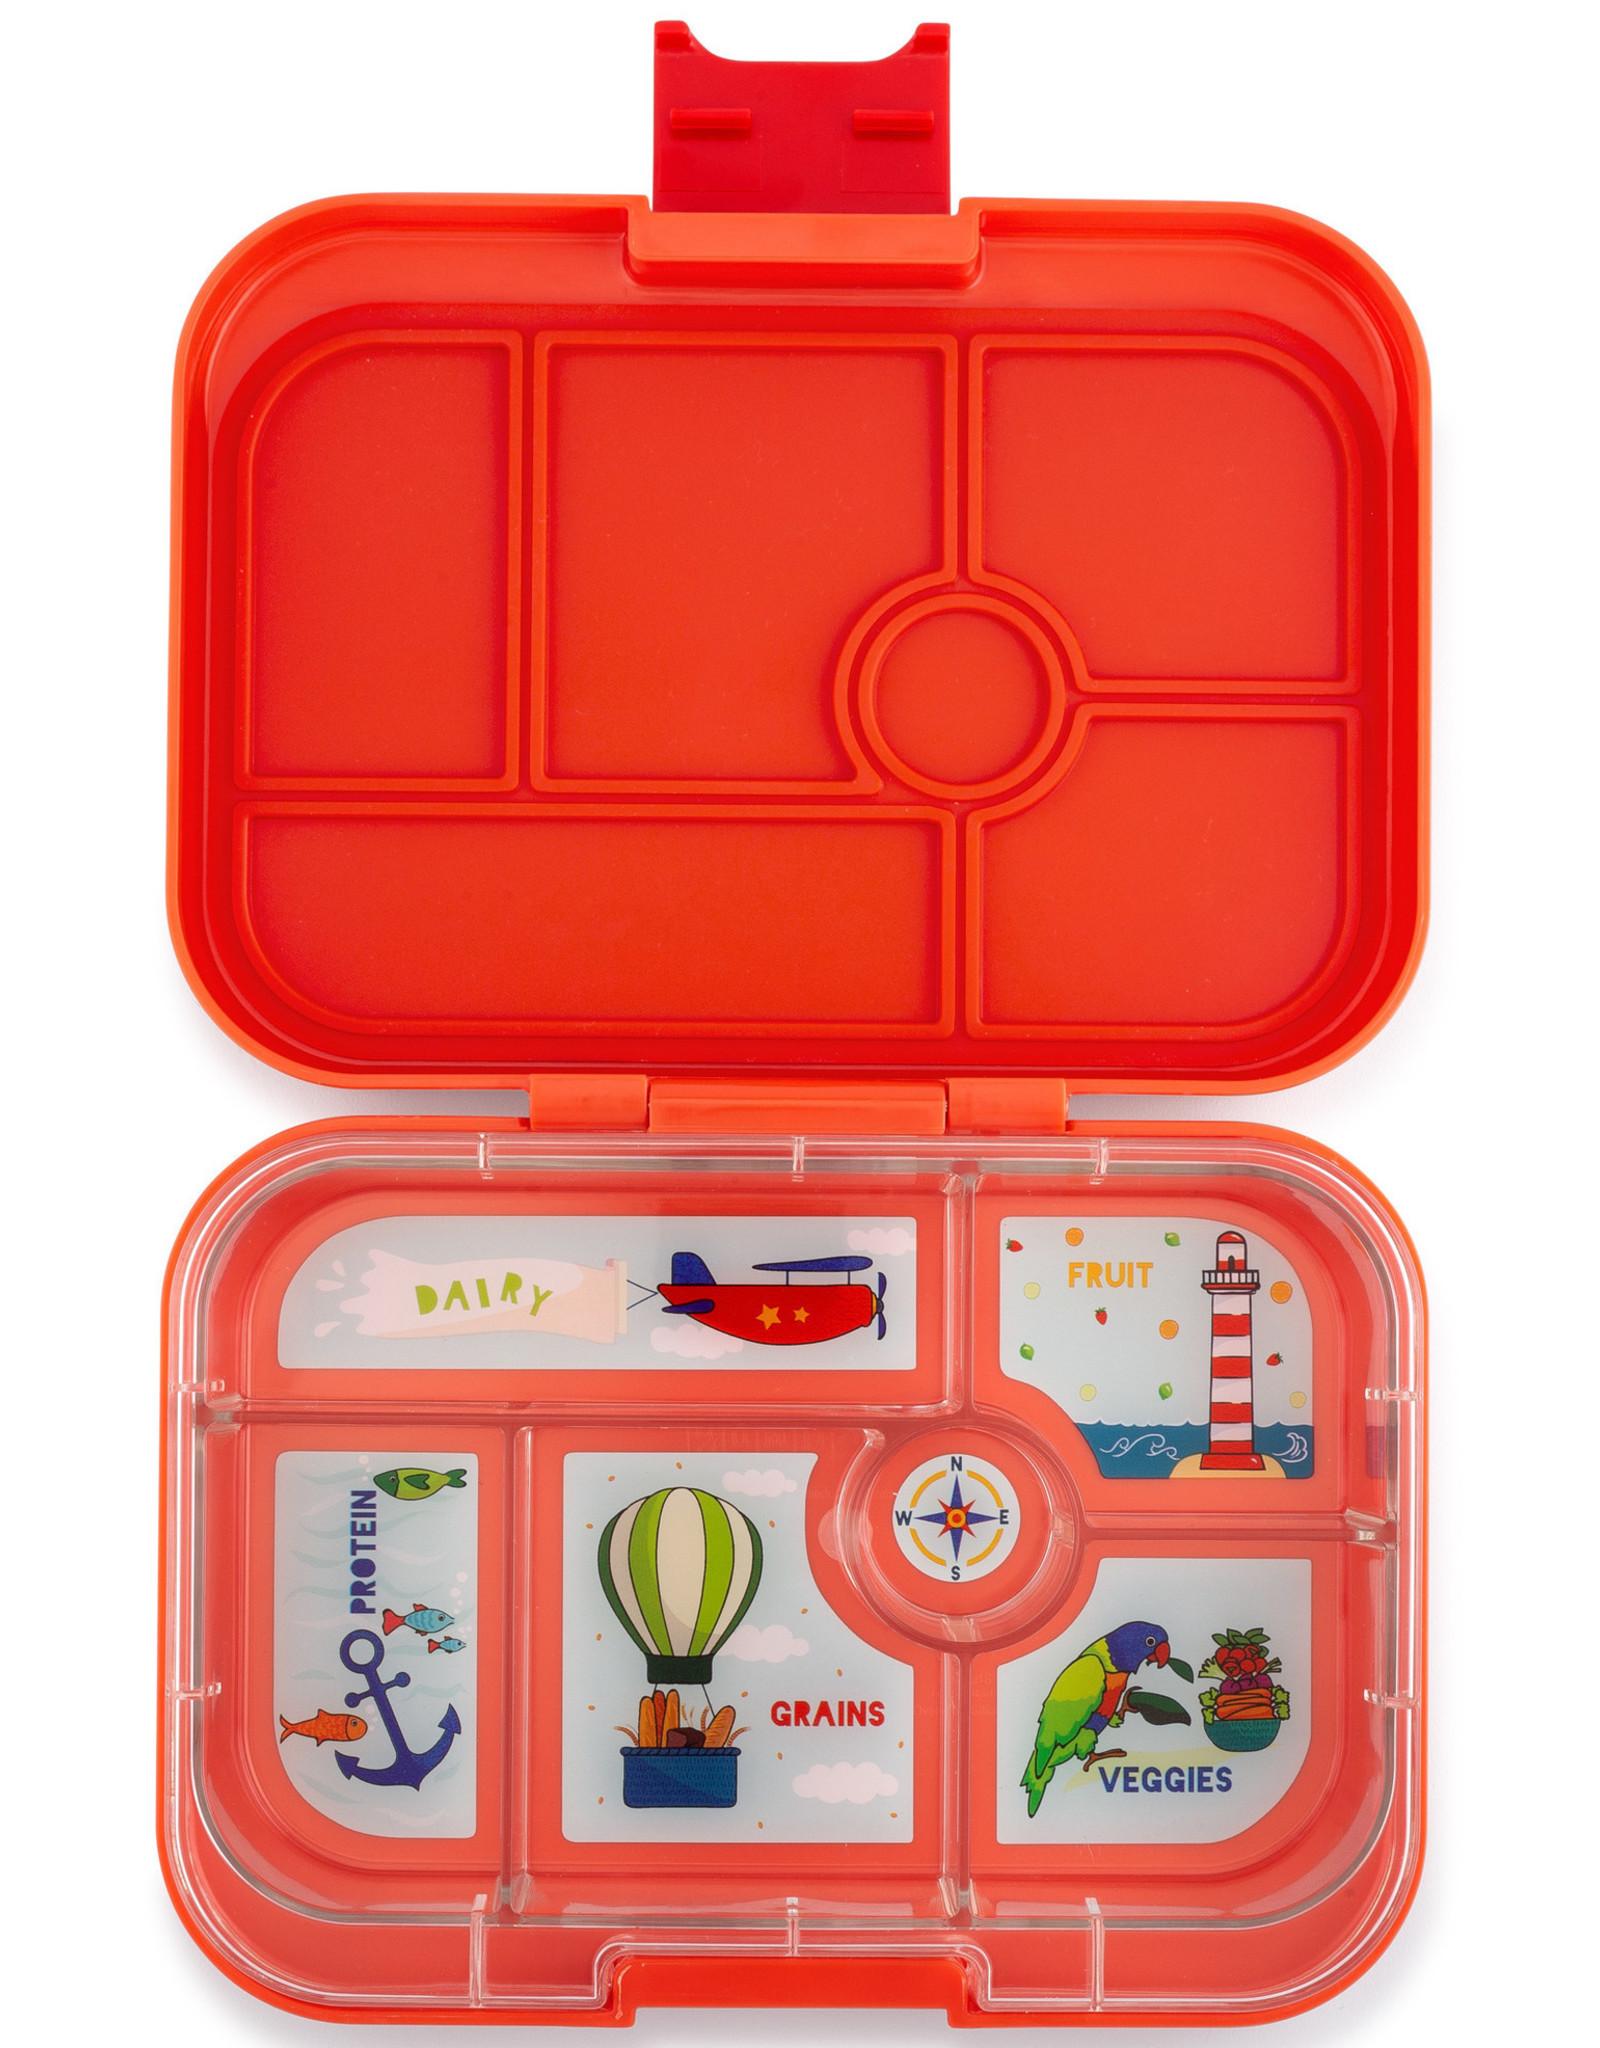 Yumbox Yumbox Original 6-vakken Saffron Oranje / Explore Tray  Original 6-vakken Kashmir aqua / Explore Tray - Copy